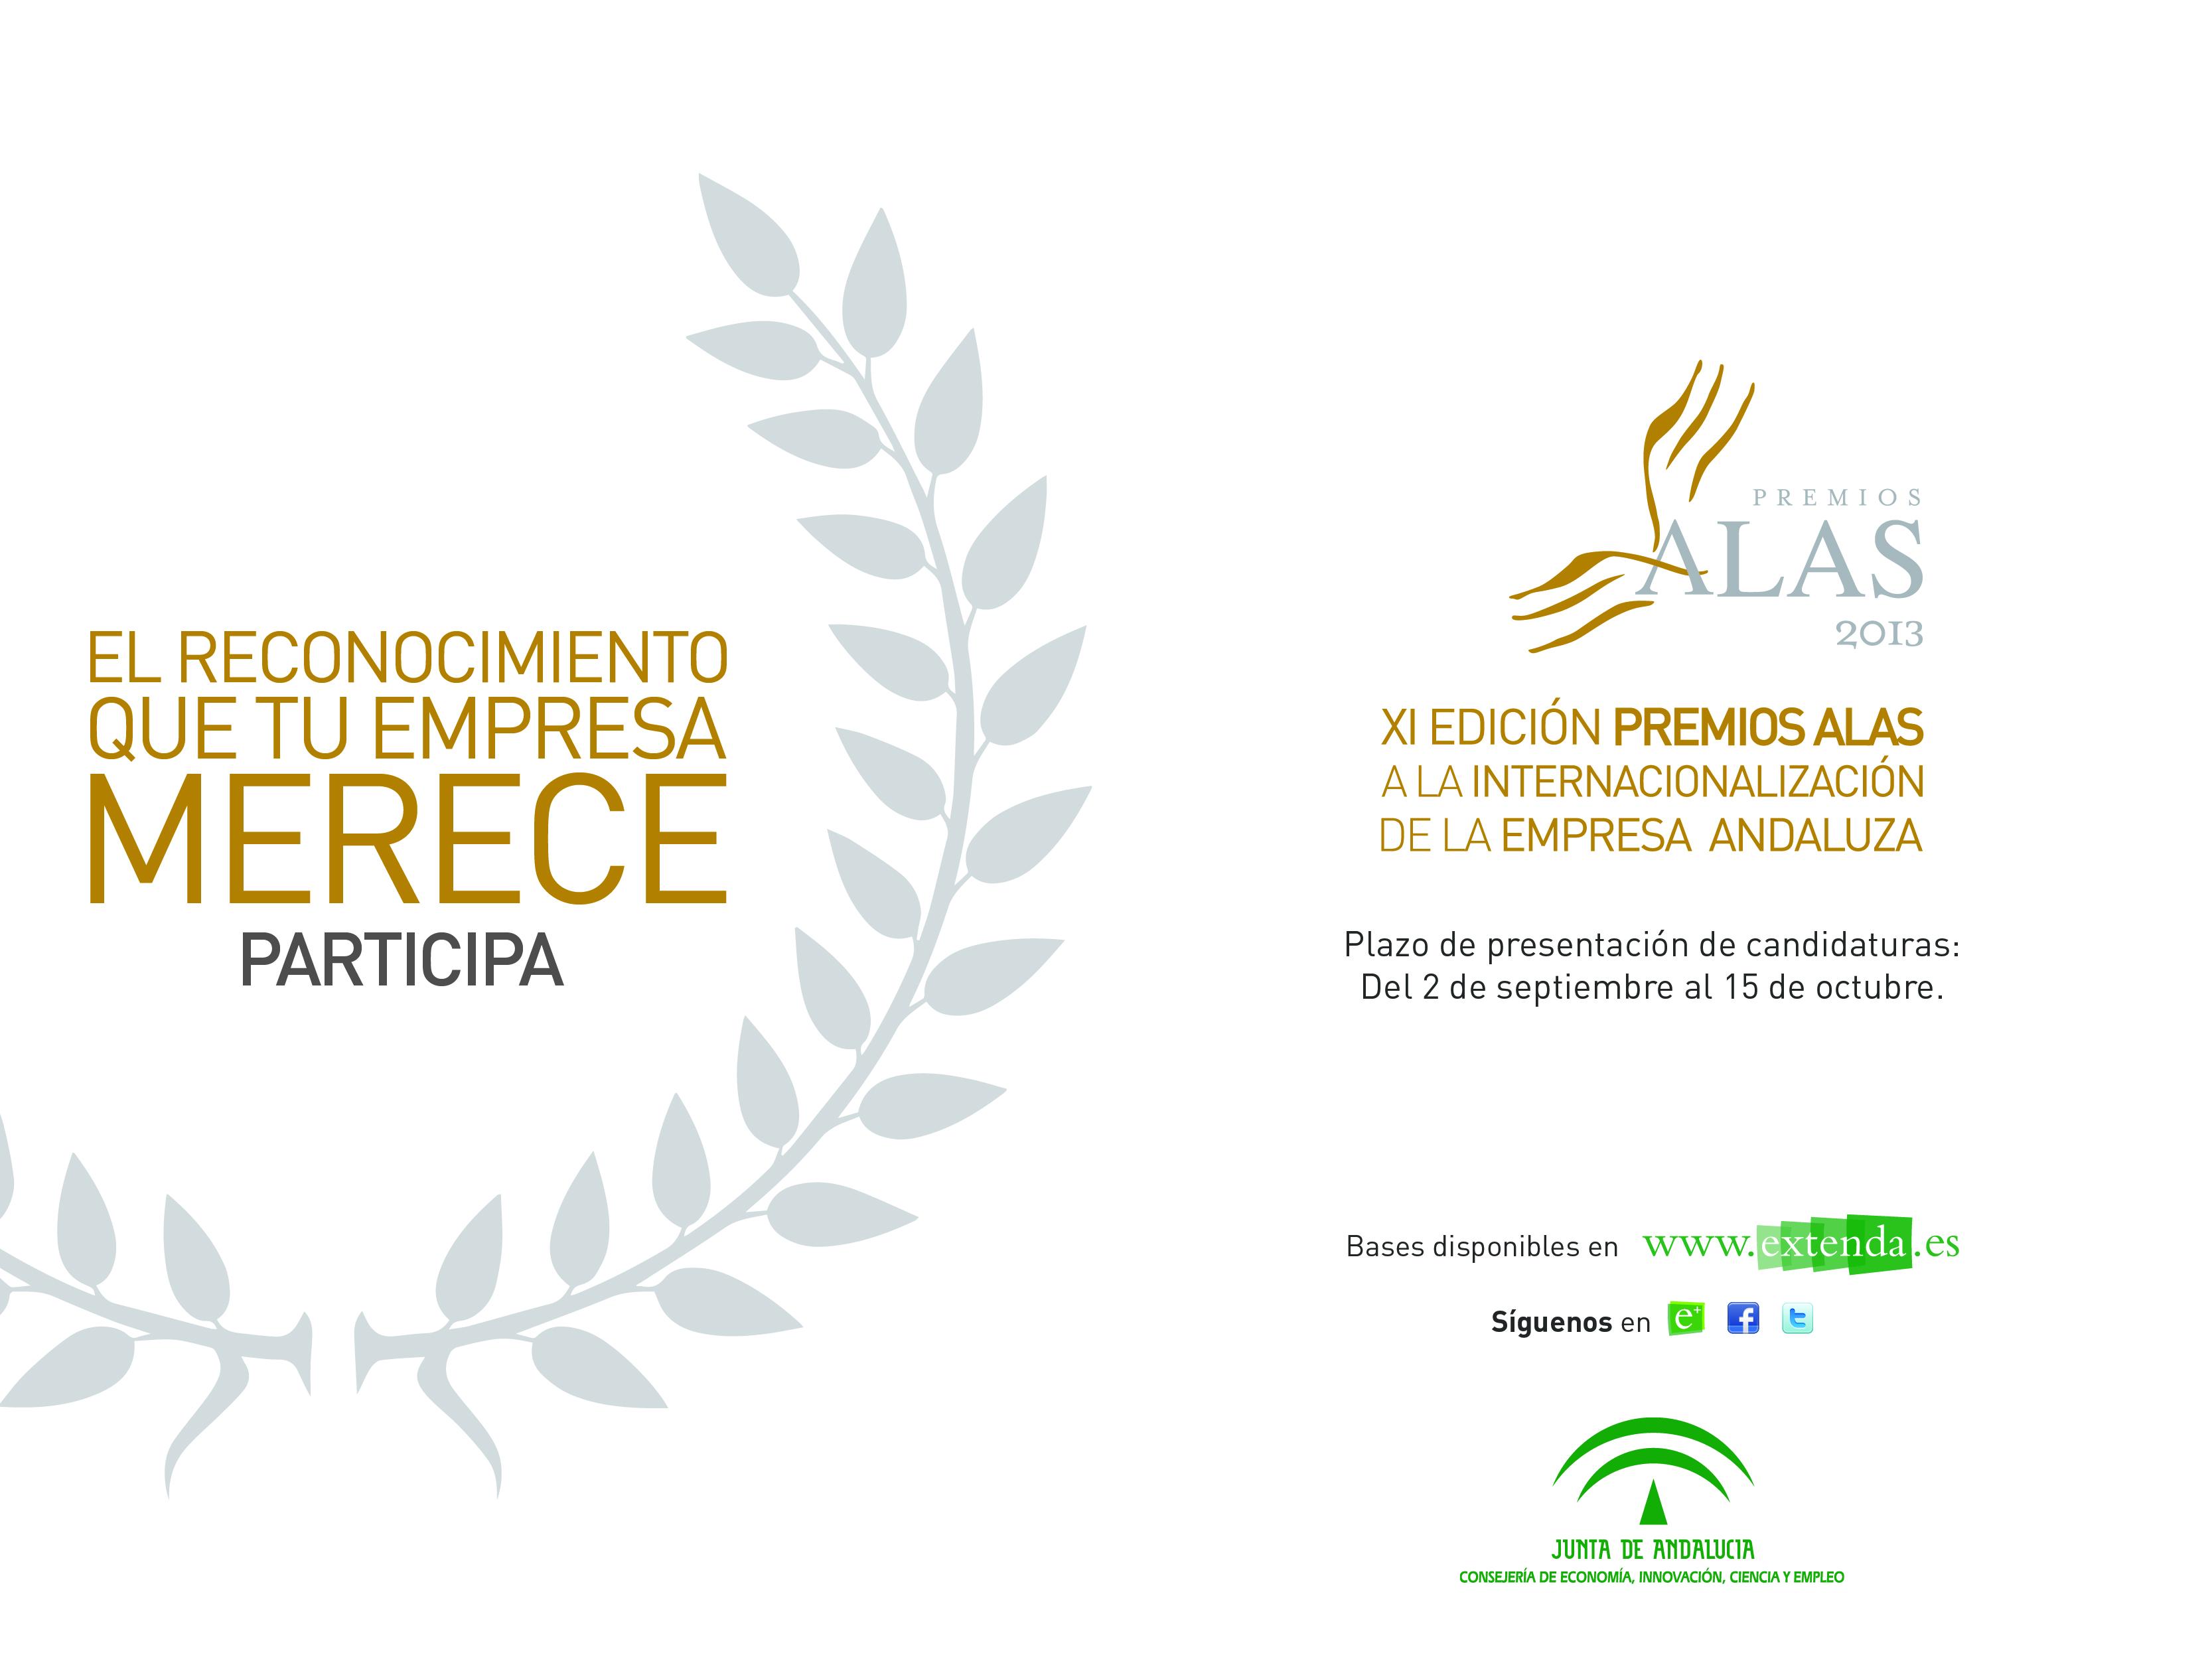 Premios ALAS 2013